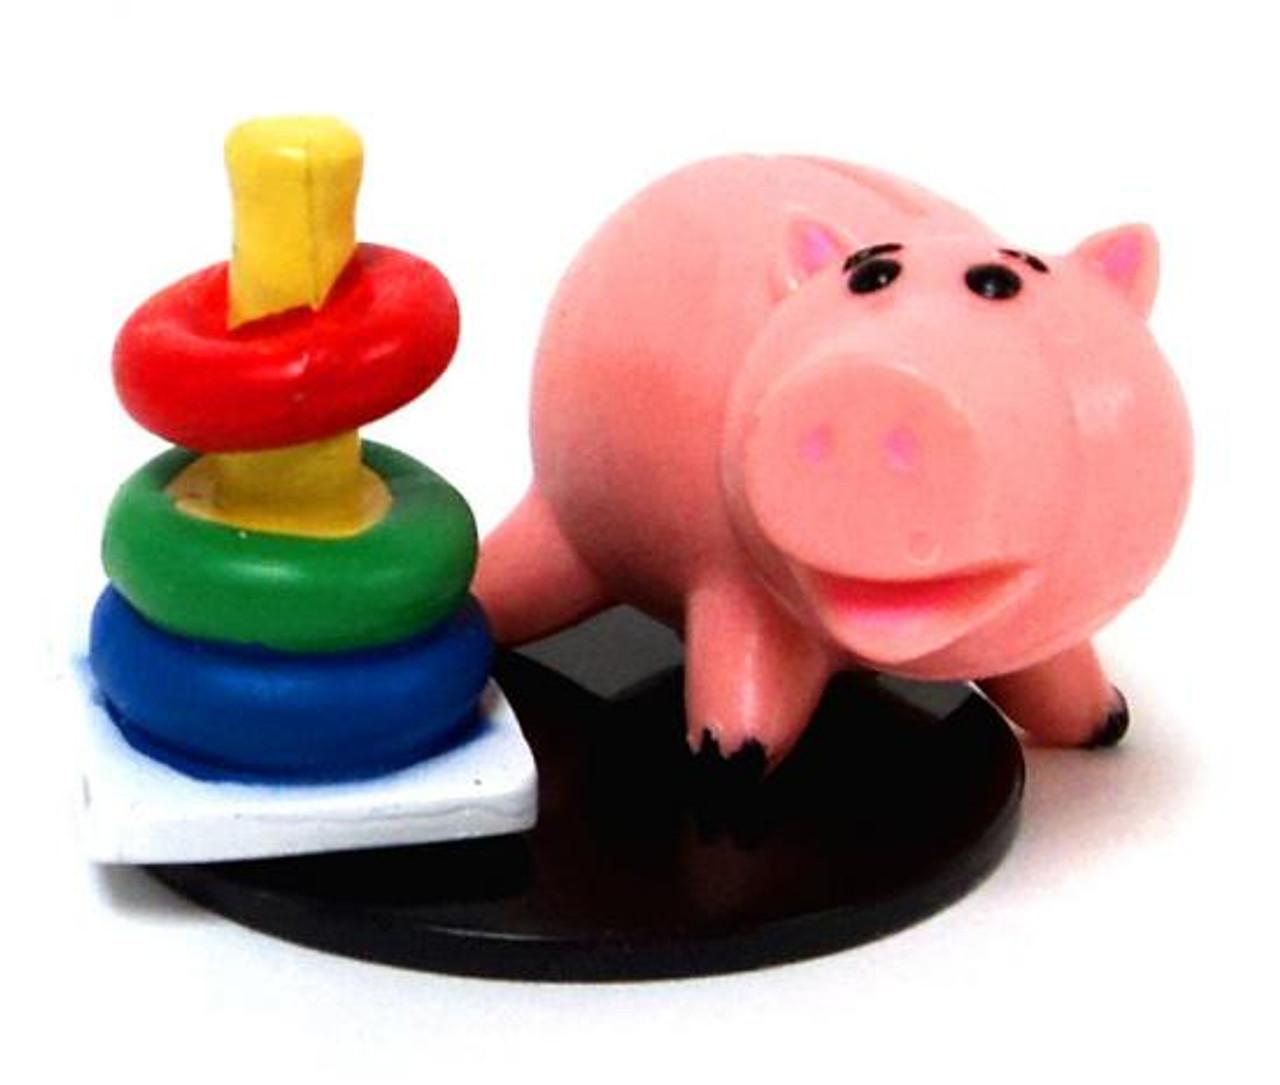 Toy Story Gashapon Hamm 2.5-Inch Mini Figure